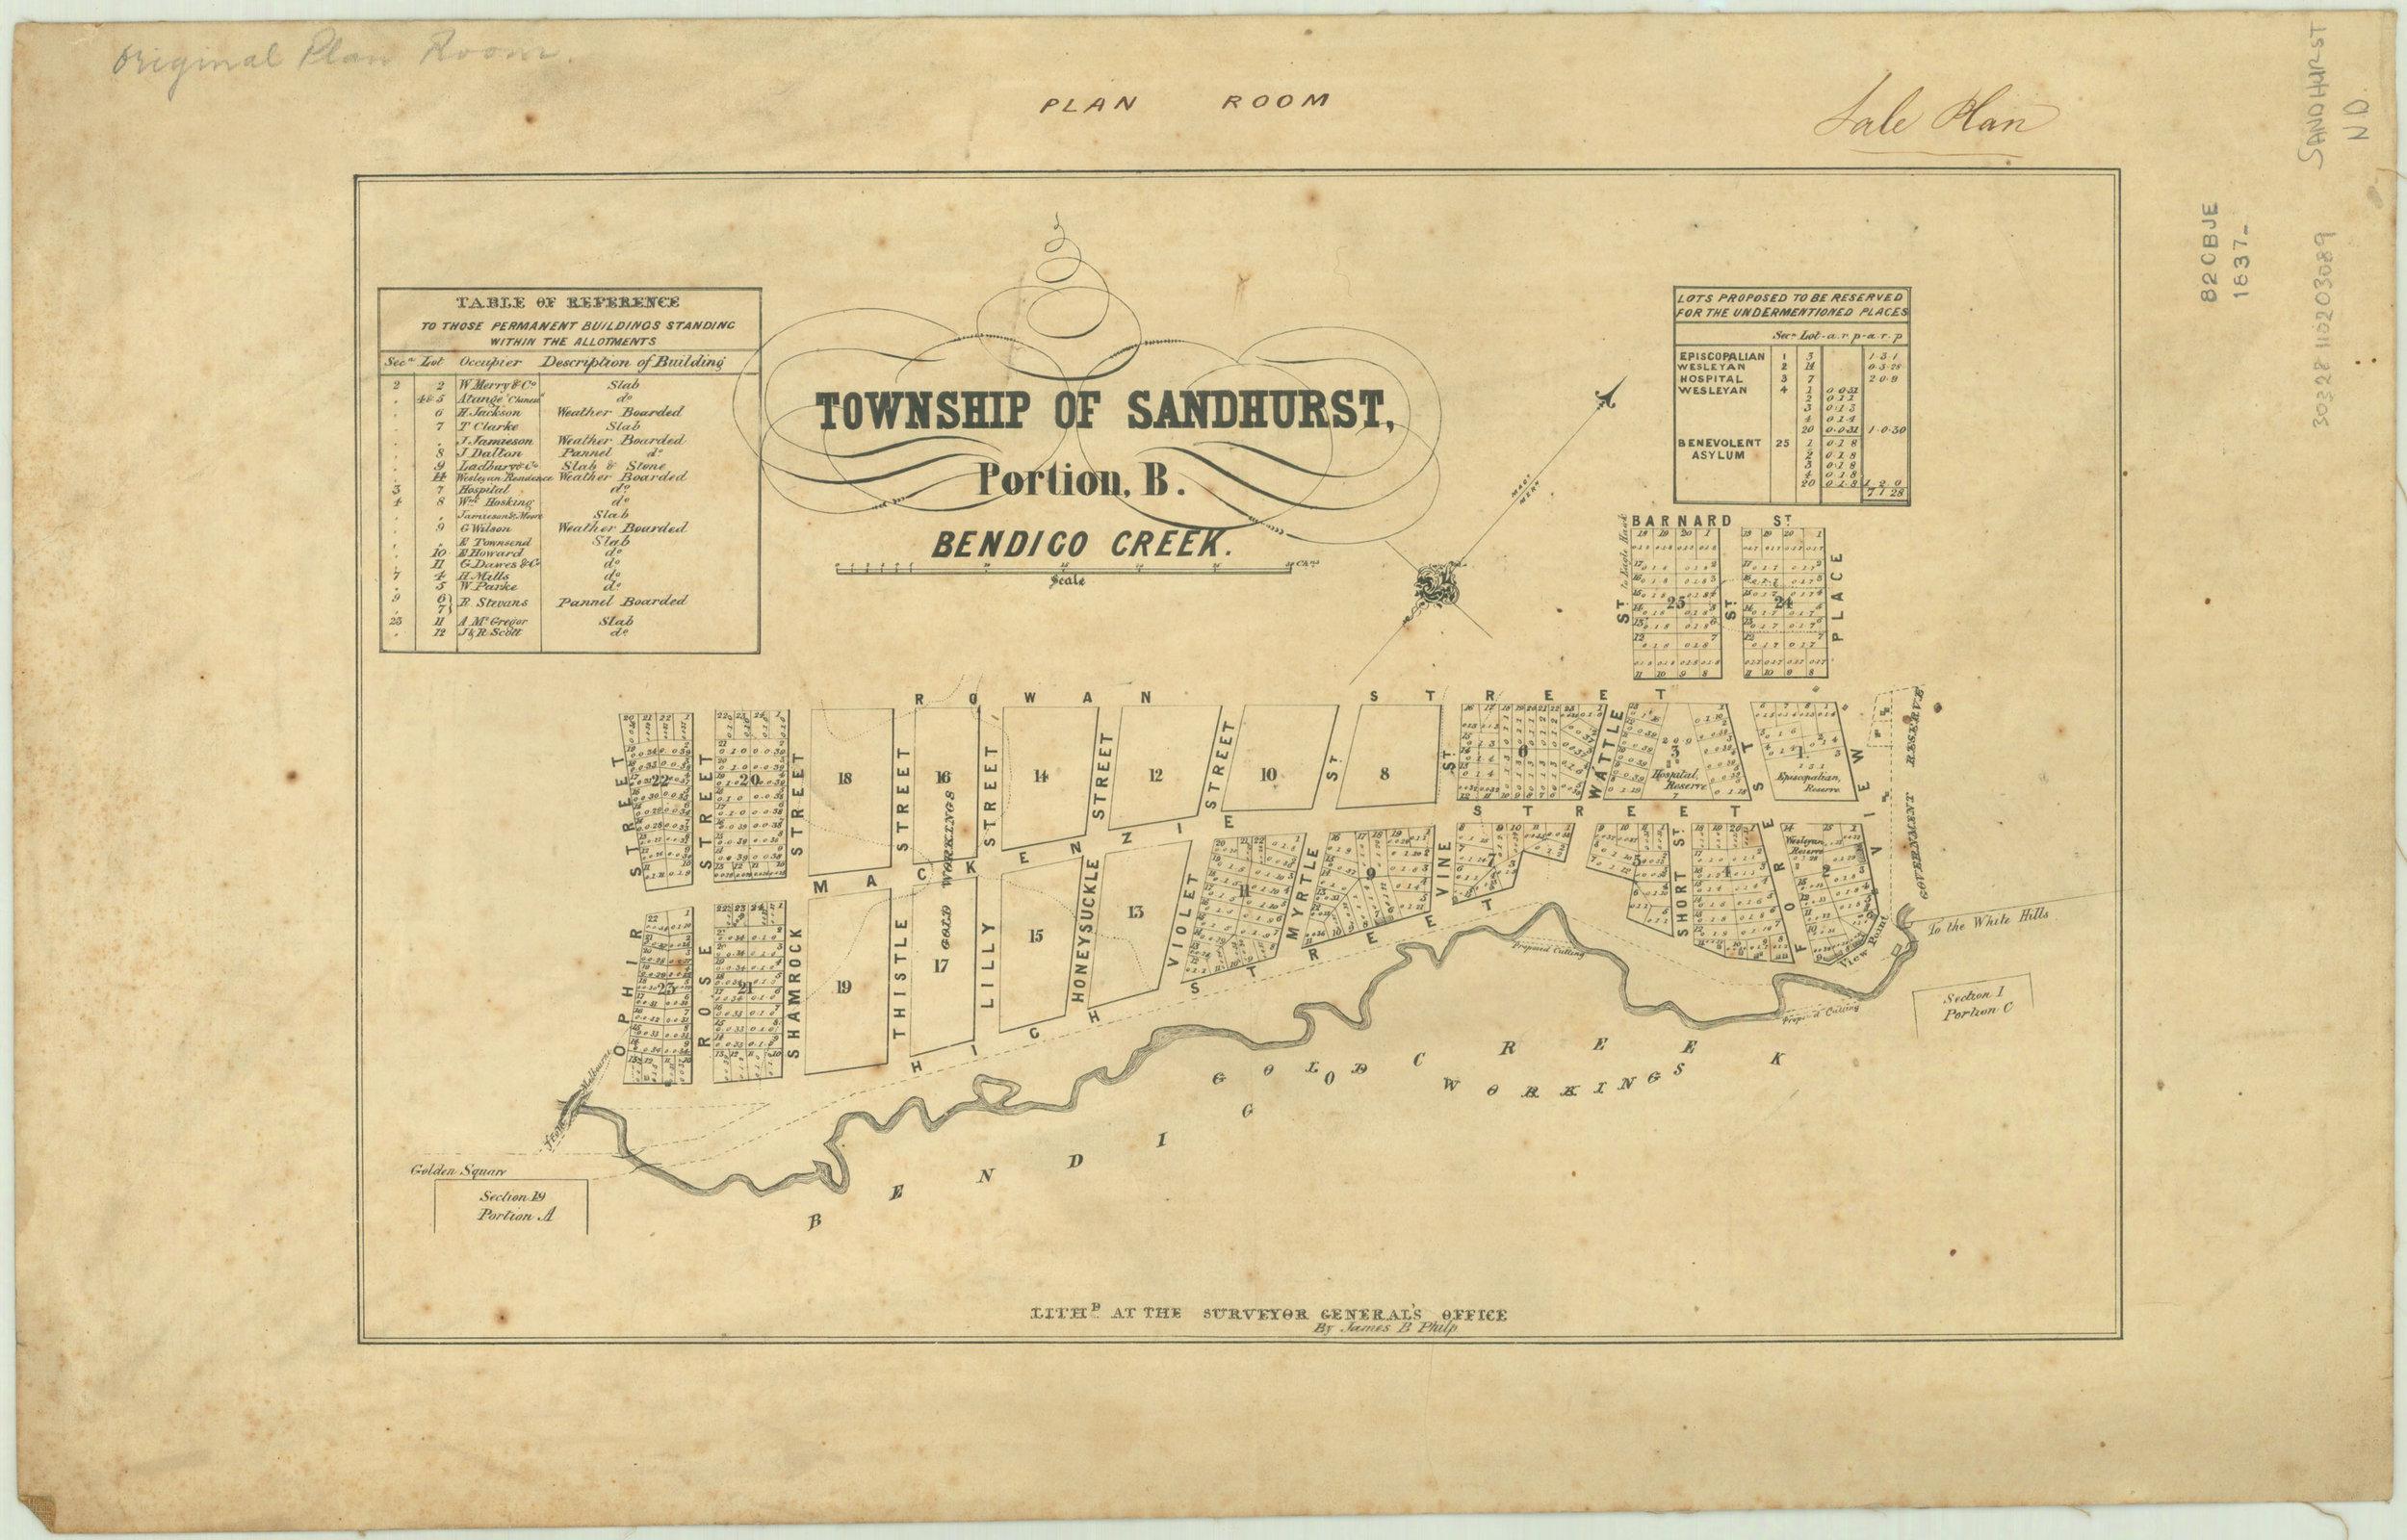 Township-of-Sandhurst,-portion-B,-Bendigo-Creek-[cartographic-material]-_-lith.d-at-the-Surveyor-General's-Office,-Melbourne,-by-James-B.-Philp.-1837.jpg